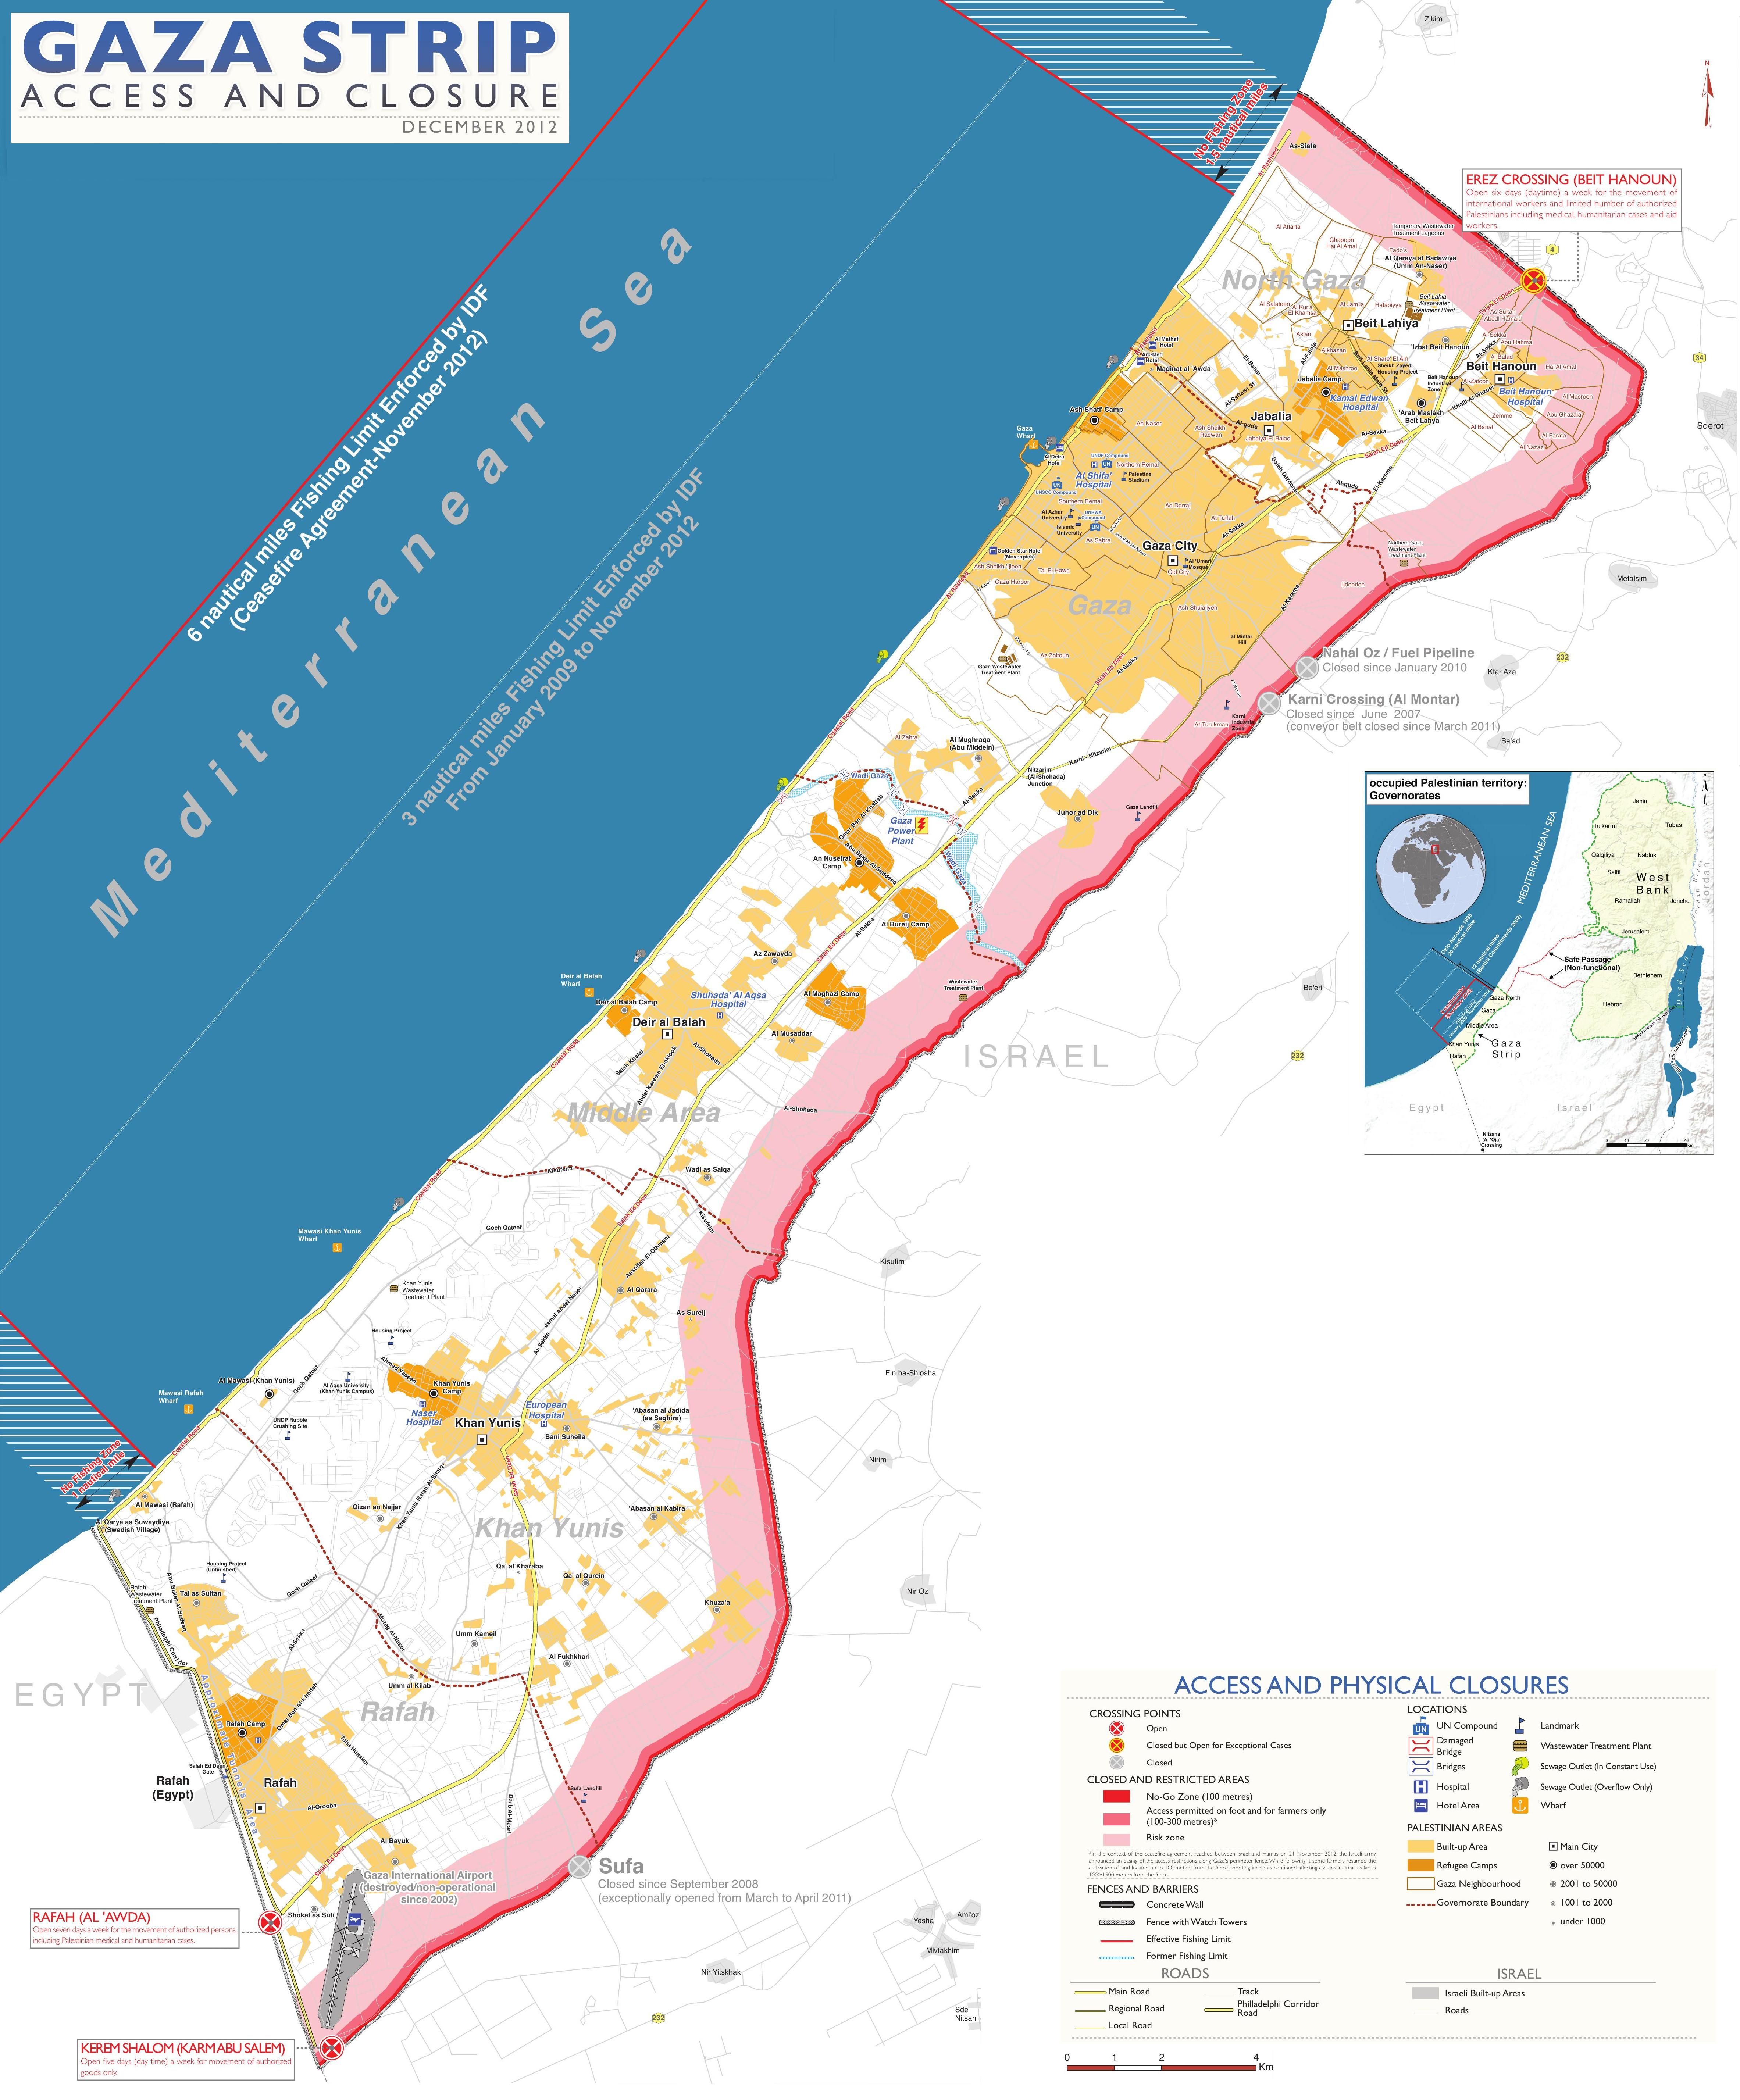 Gaza Facts by Quadraro